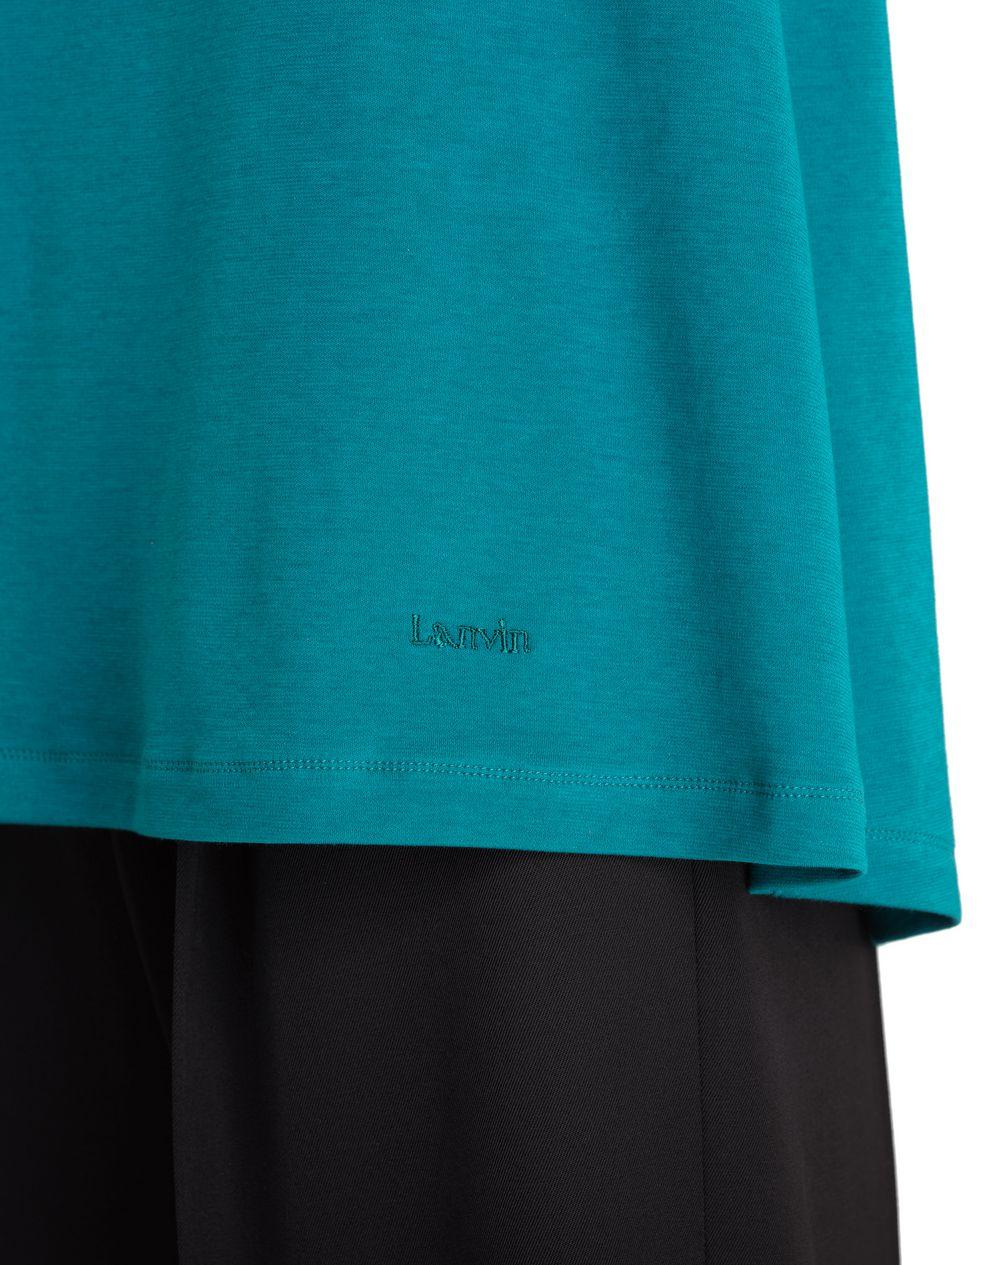 PEACOCK BLUE FRILL TOP - Lanvin